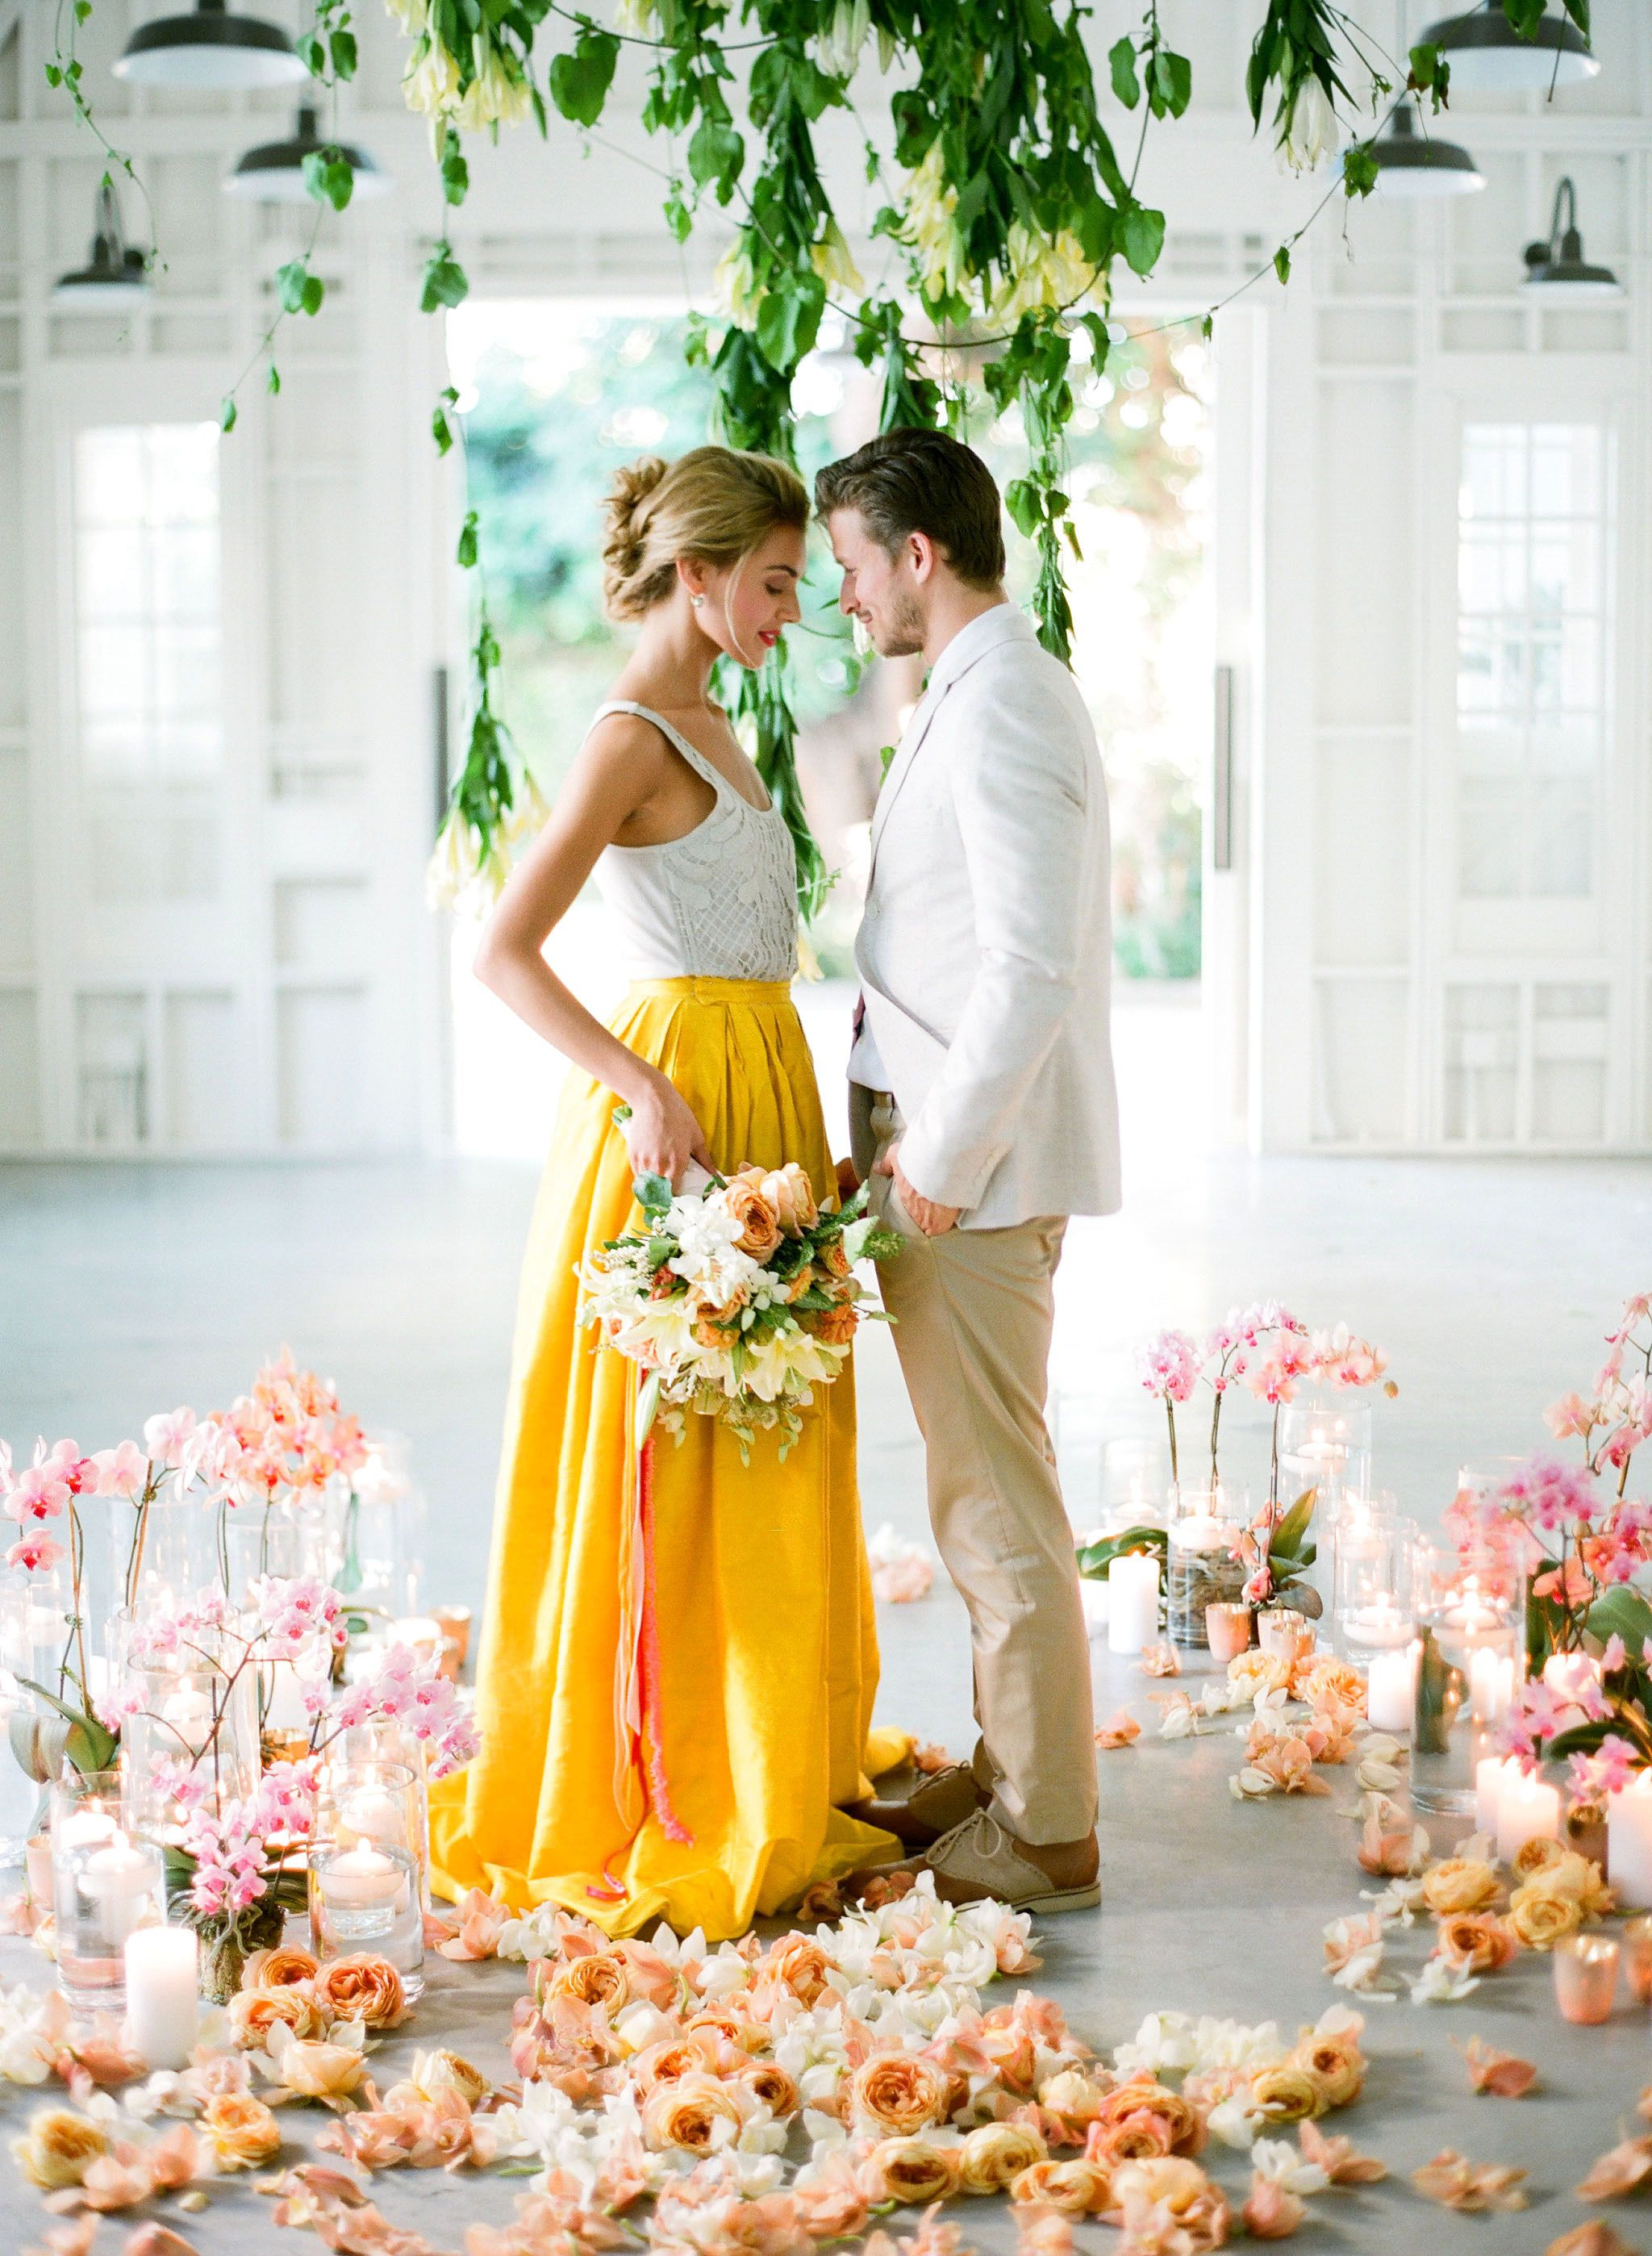 Authentic Colorful Cuban Wedding Inspiration | Villas, Photography ...